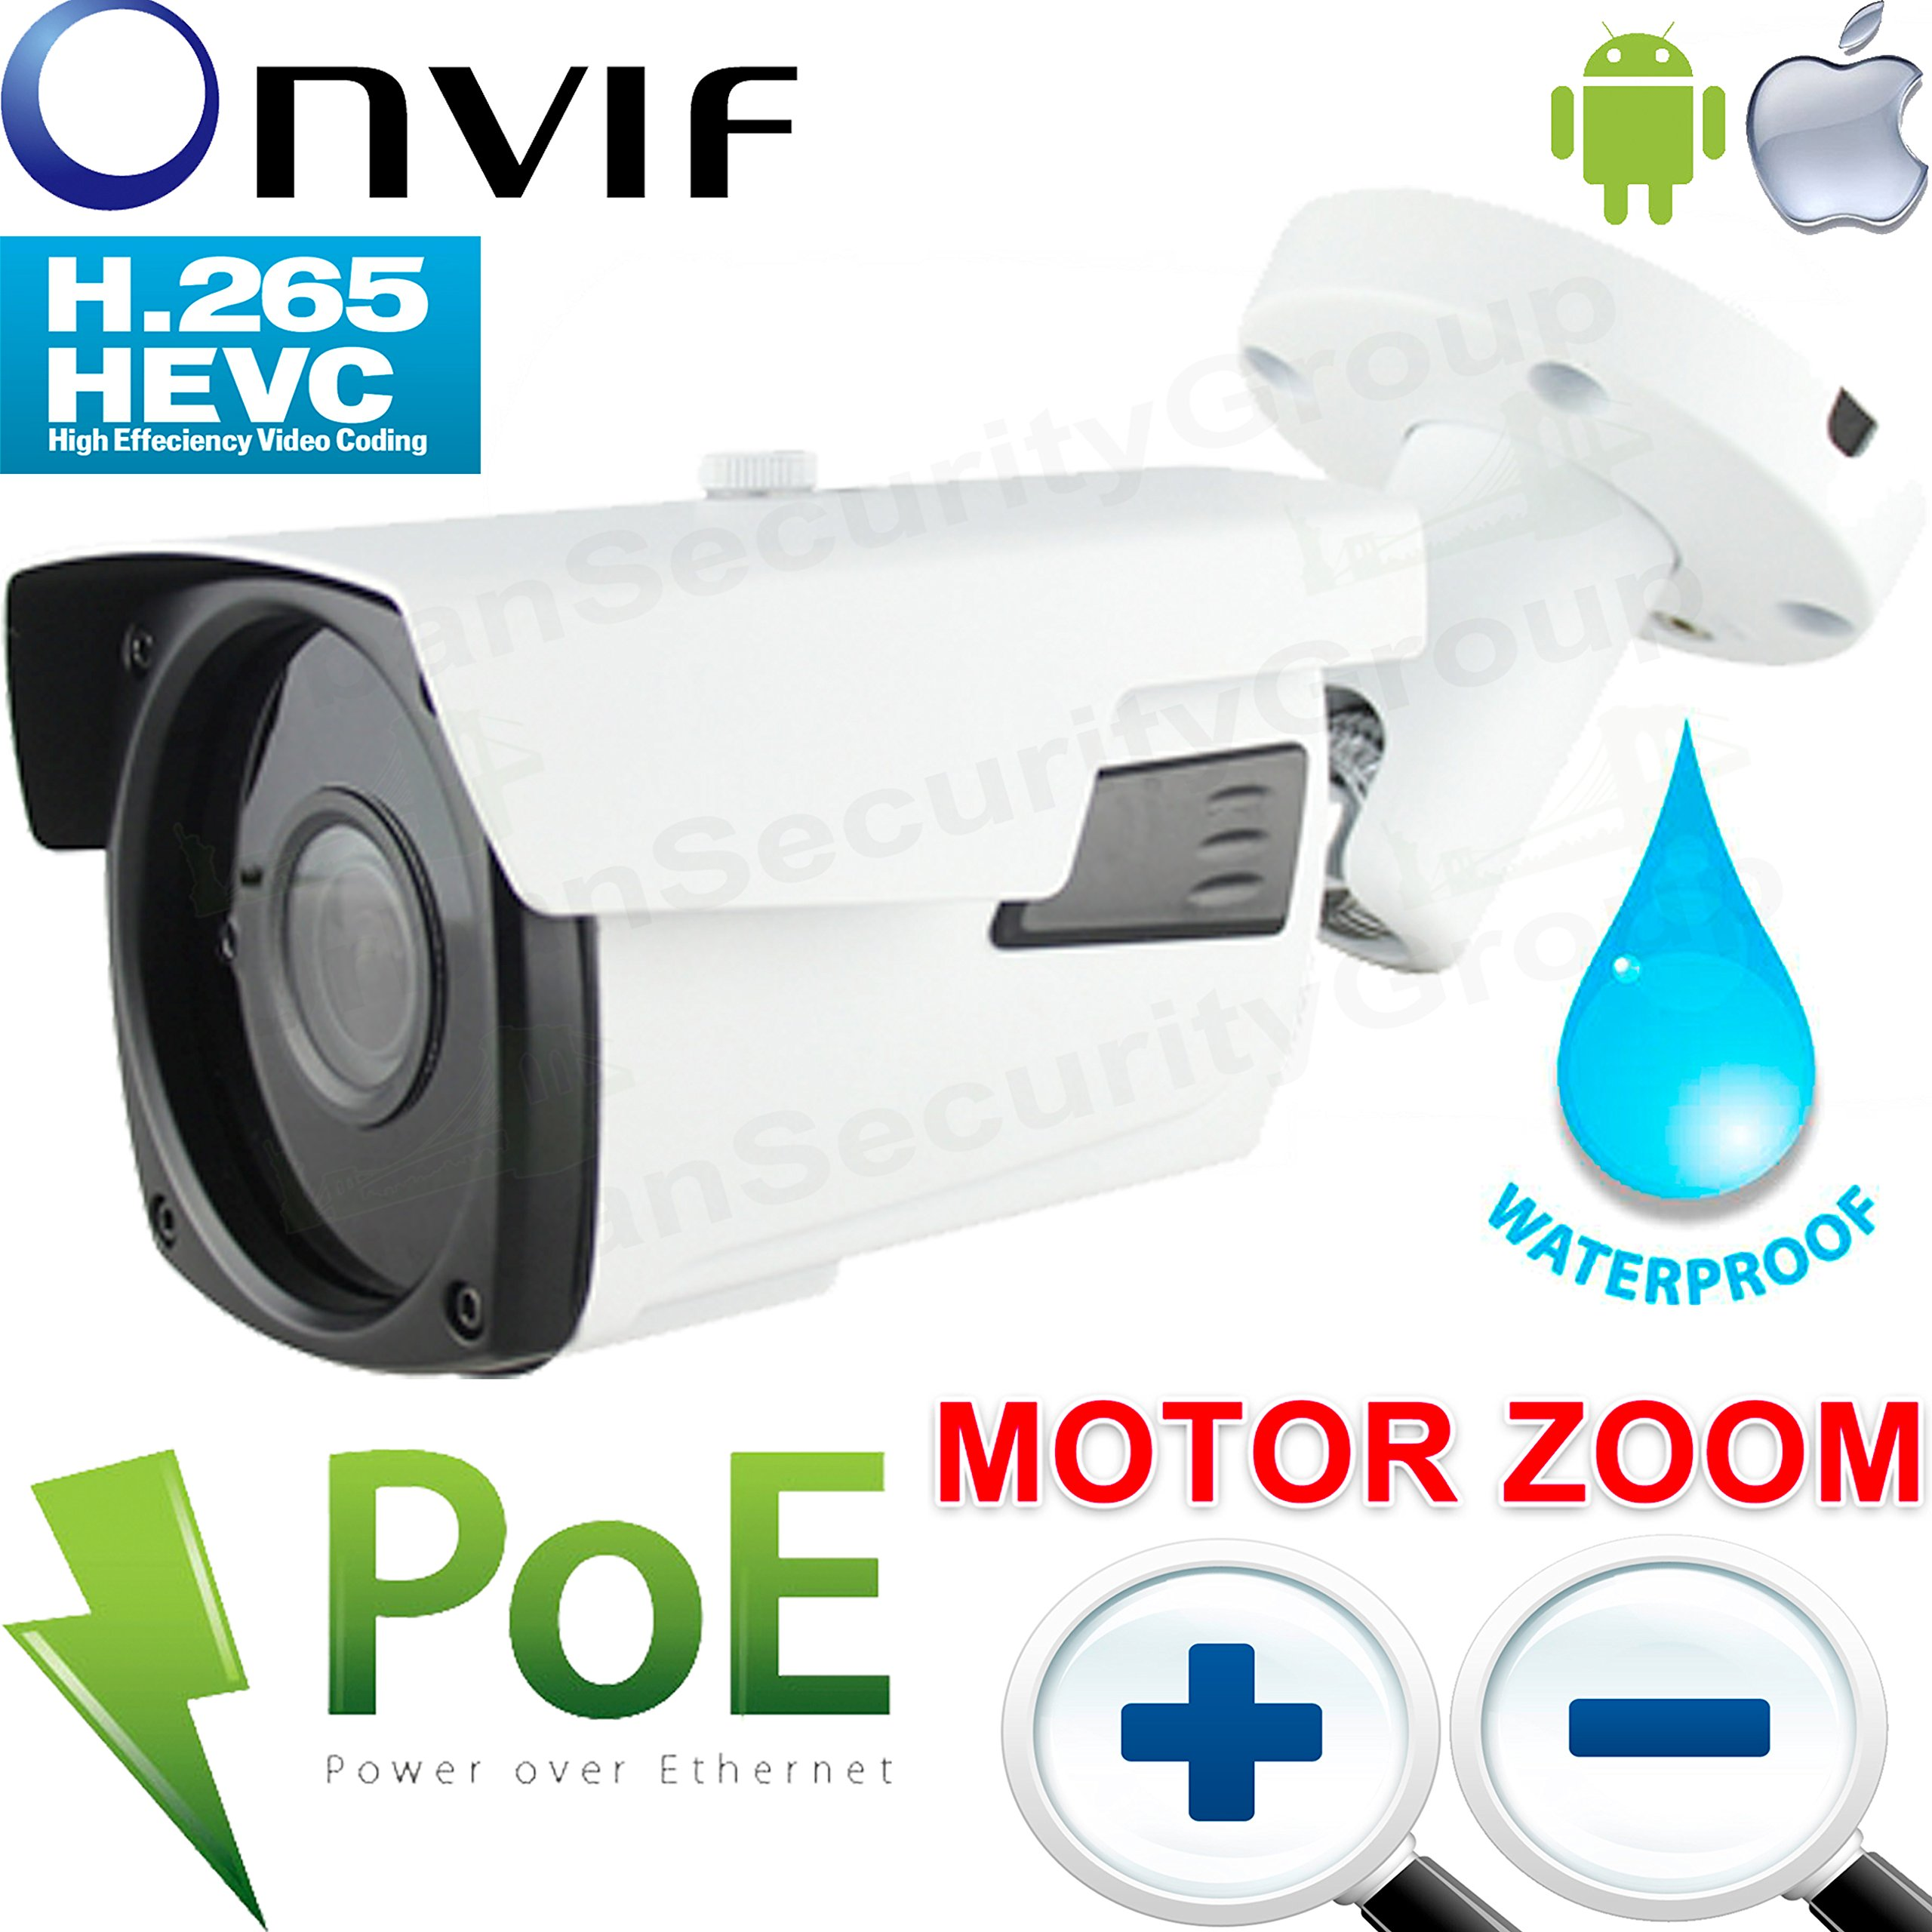 USG Ultra HD 4MP MOTORIZED 2.7-13.5mm 5x Zoom H.265 Ultra HD IP PoE Network Bullet Security Camera : 5MP 2.7-13.5mm Auto-Focus, ONVIF, Weatherproof, IR LEDs 200ft, WDR, Business Grade, Phone App